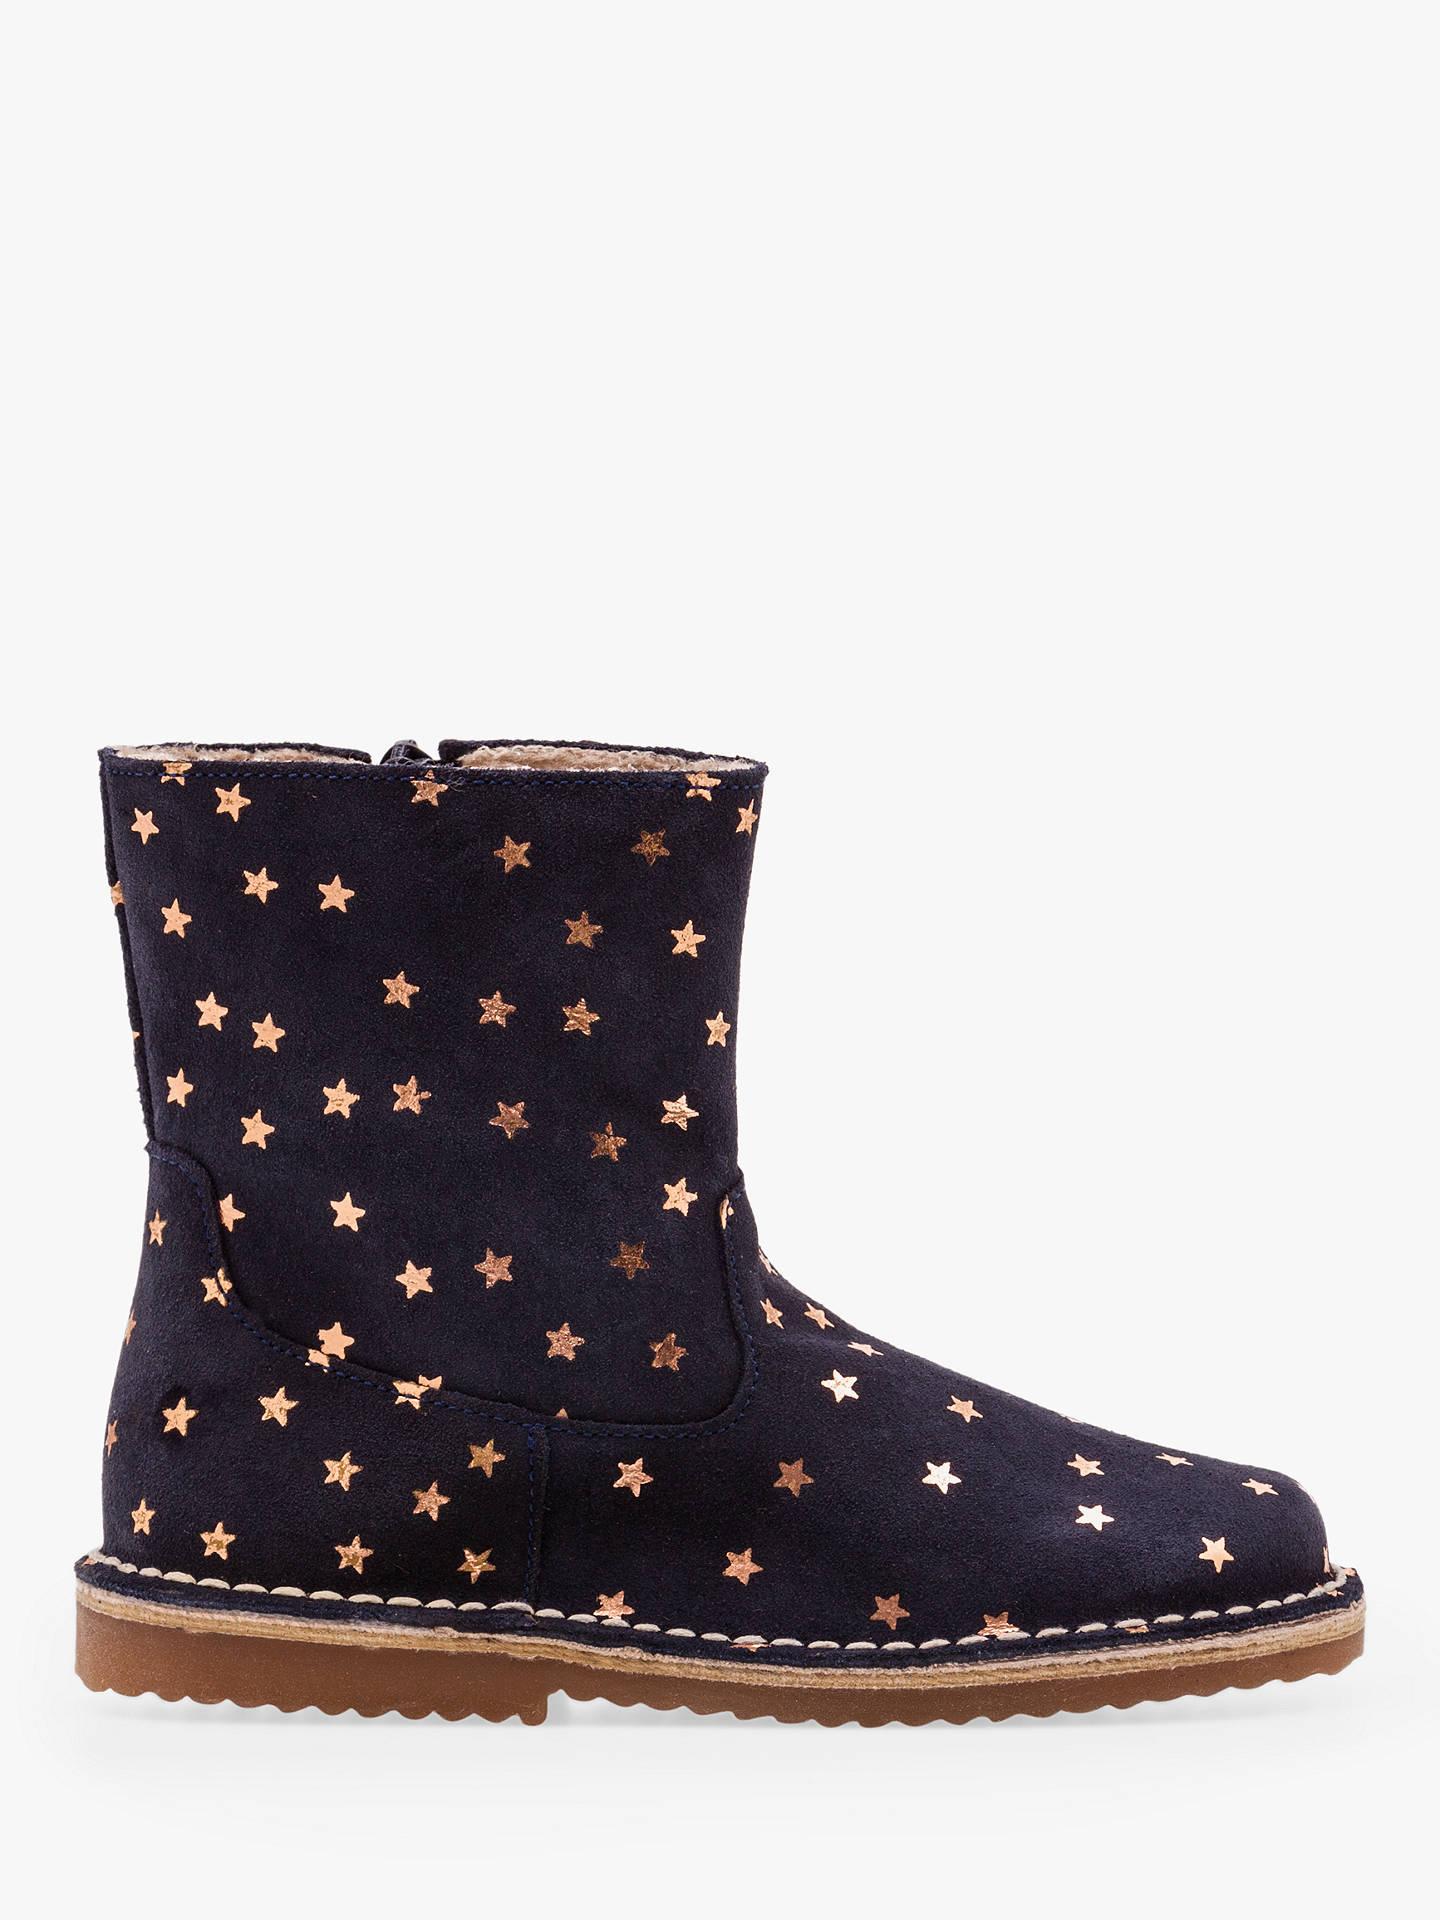 Mini Boden Children S Leather Star Boots Navy At John